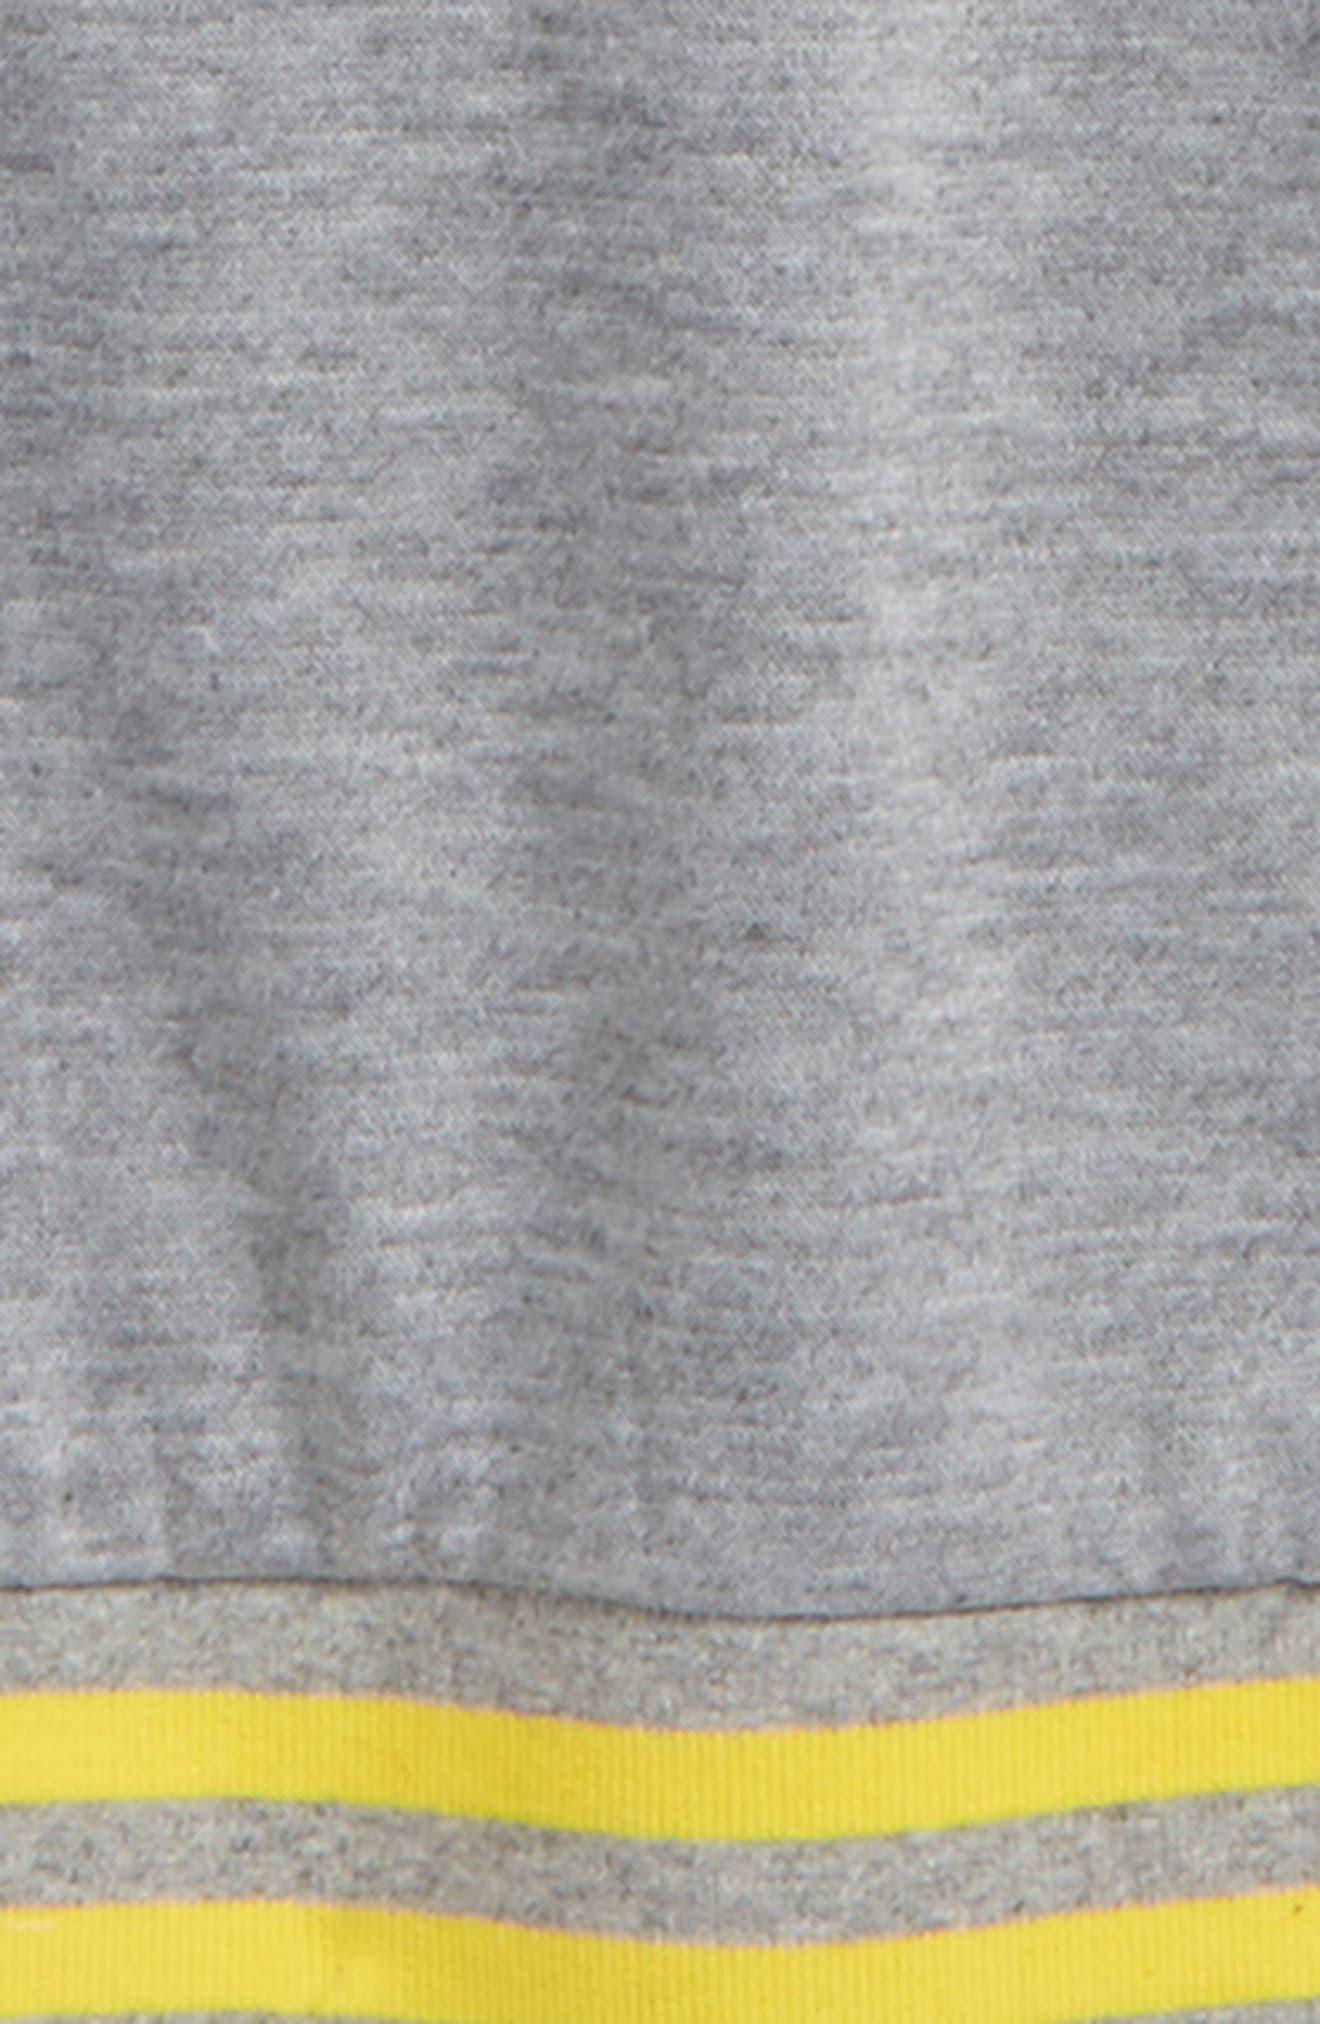 Colorblock Cold Shoulder Top,                             Alternate thumbnail 2, color,                             020